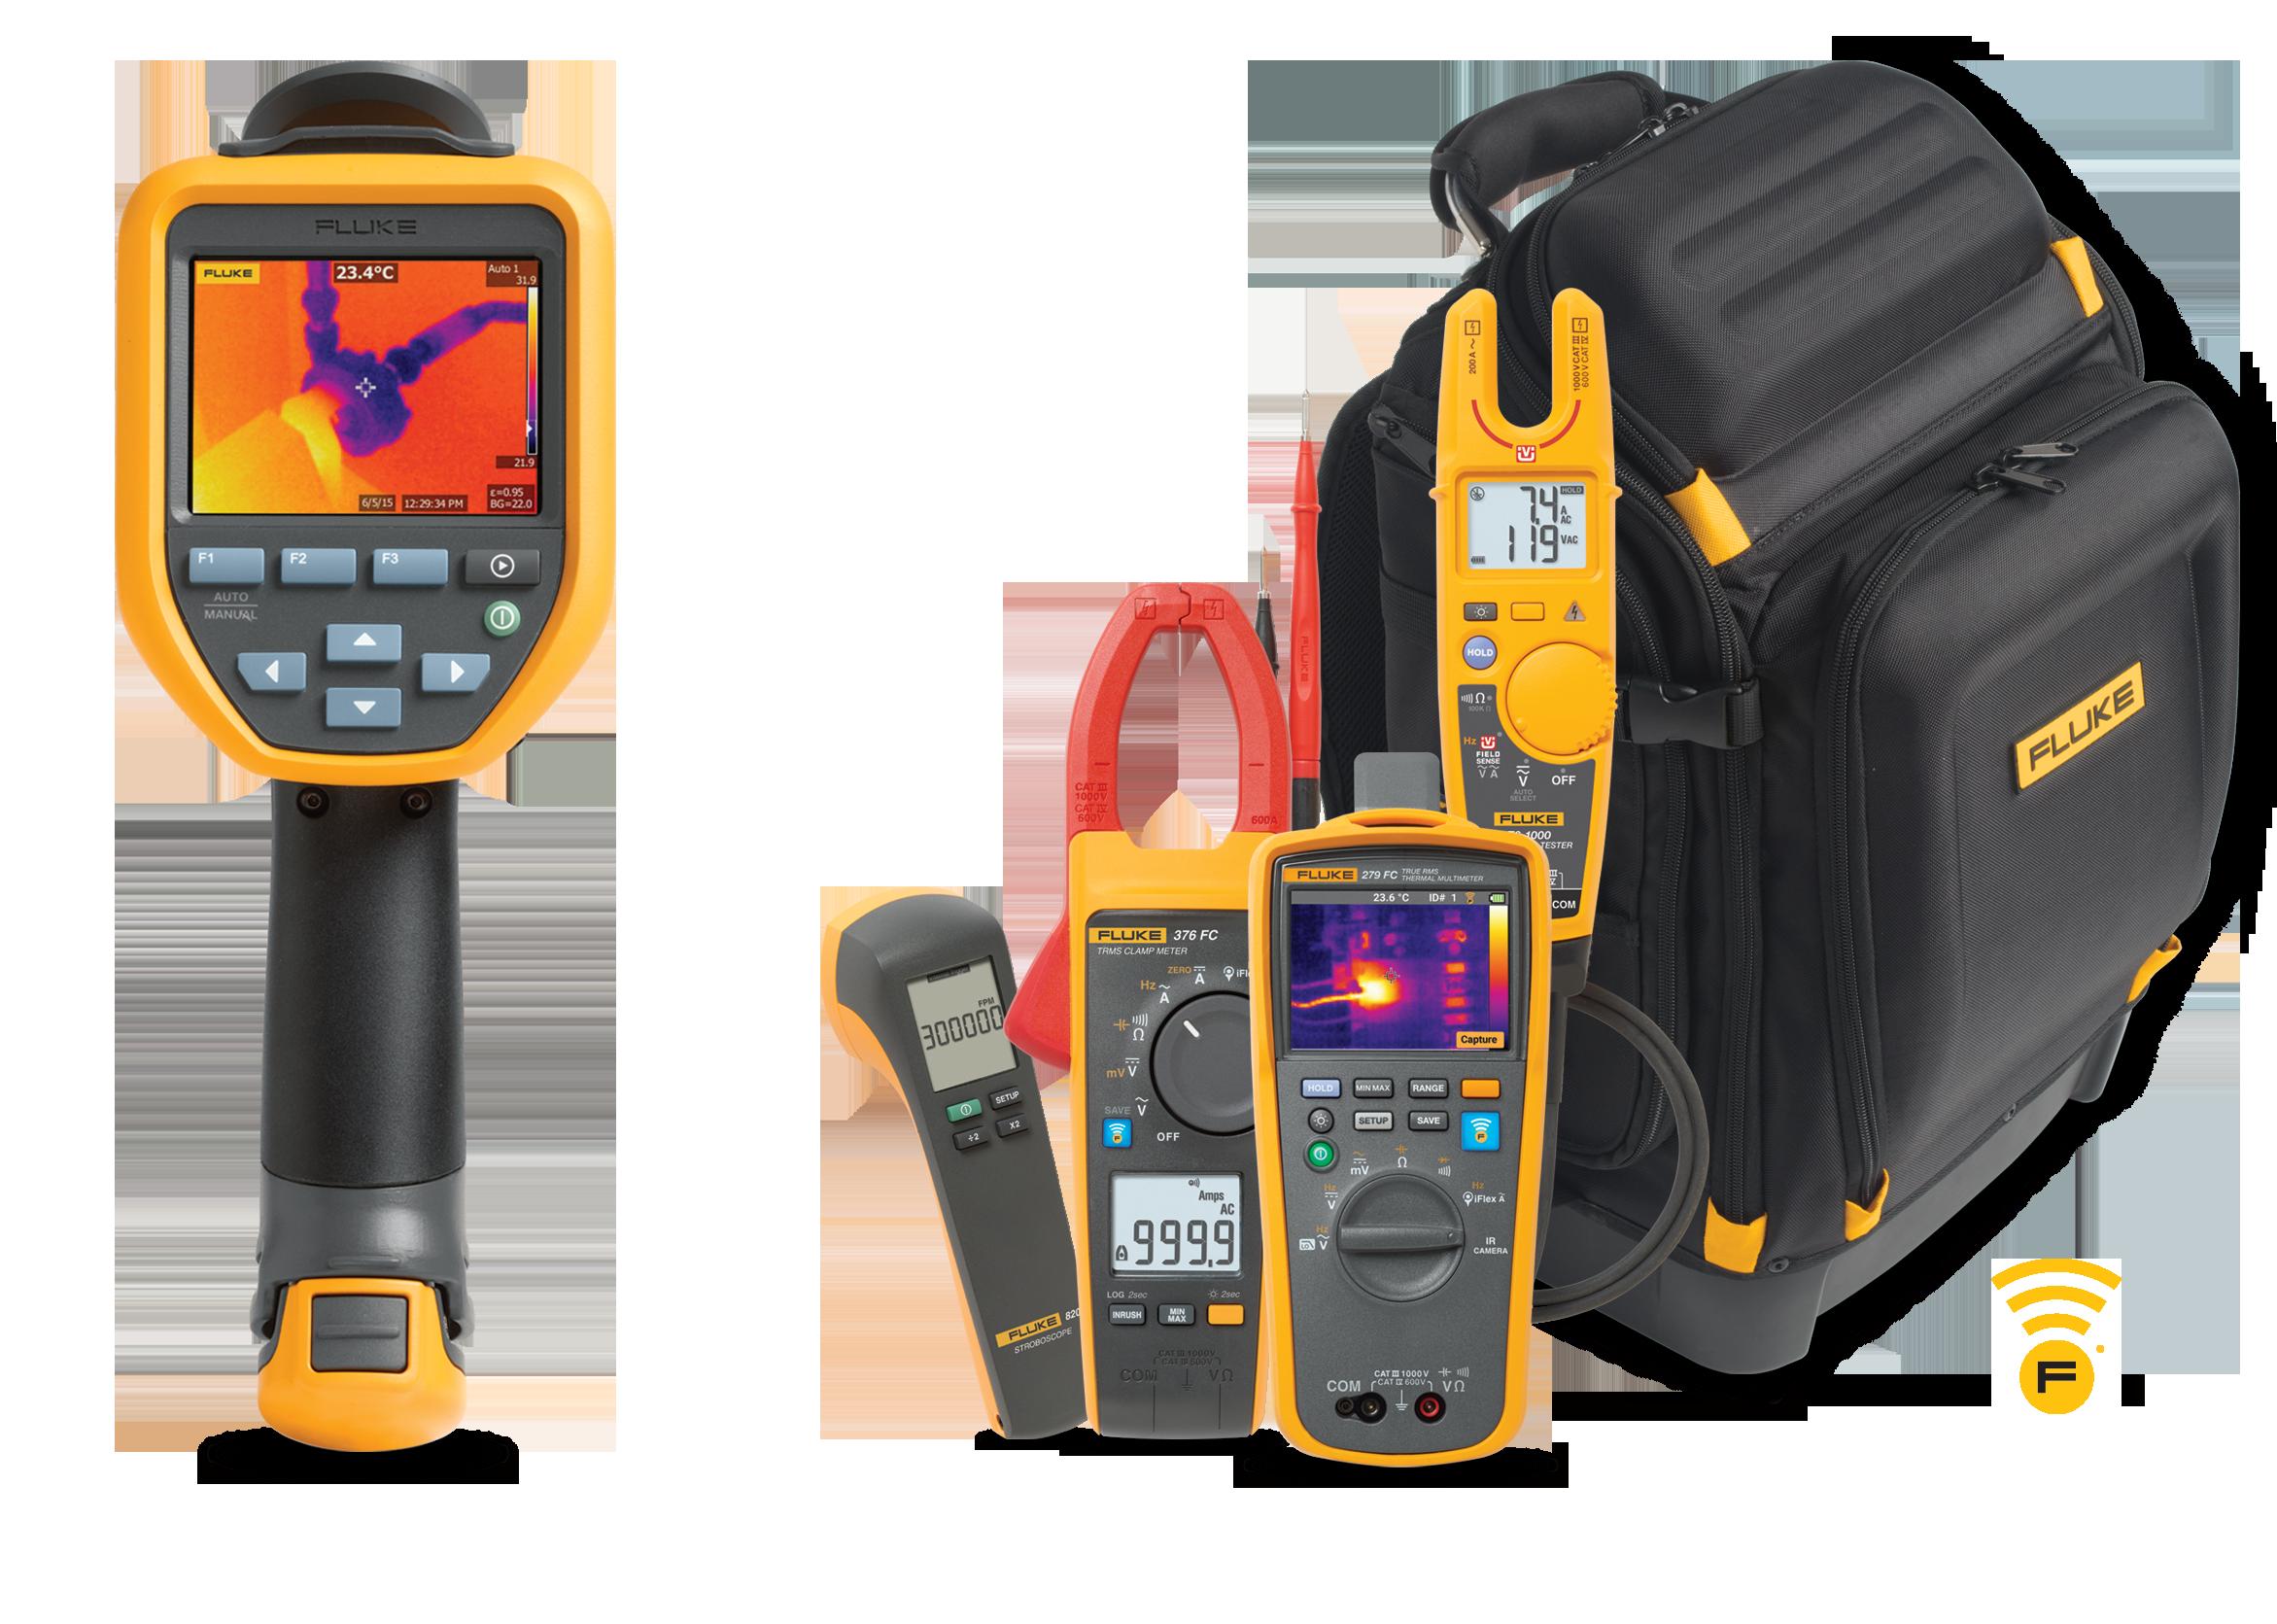 Fluke TiS45 Infrared Camera and bonus products